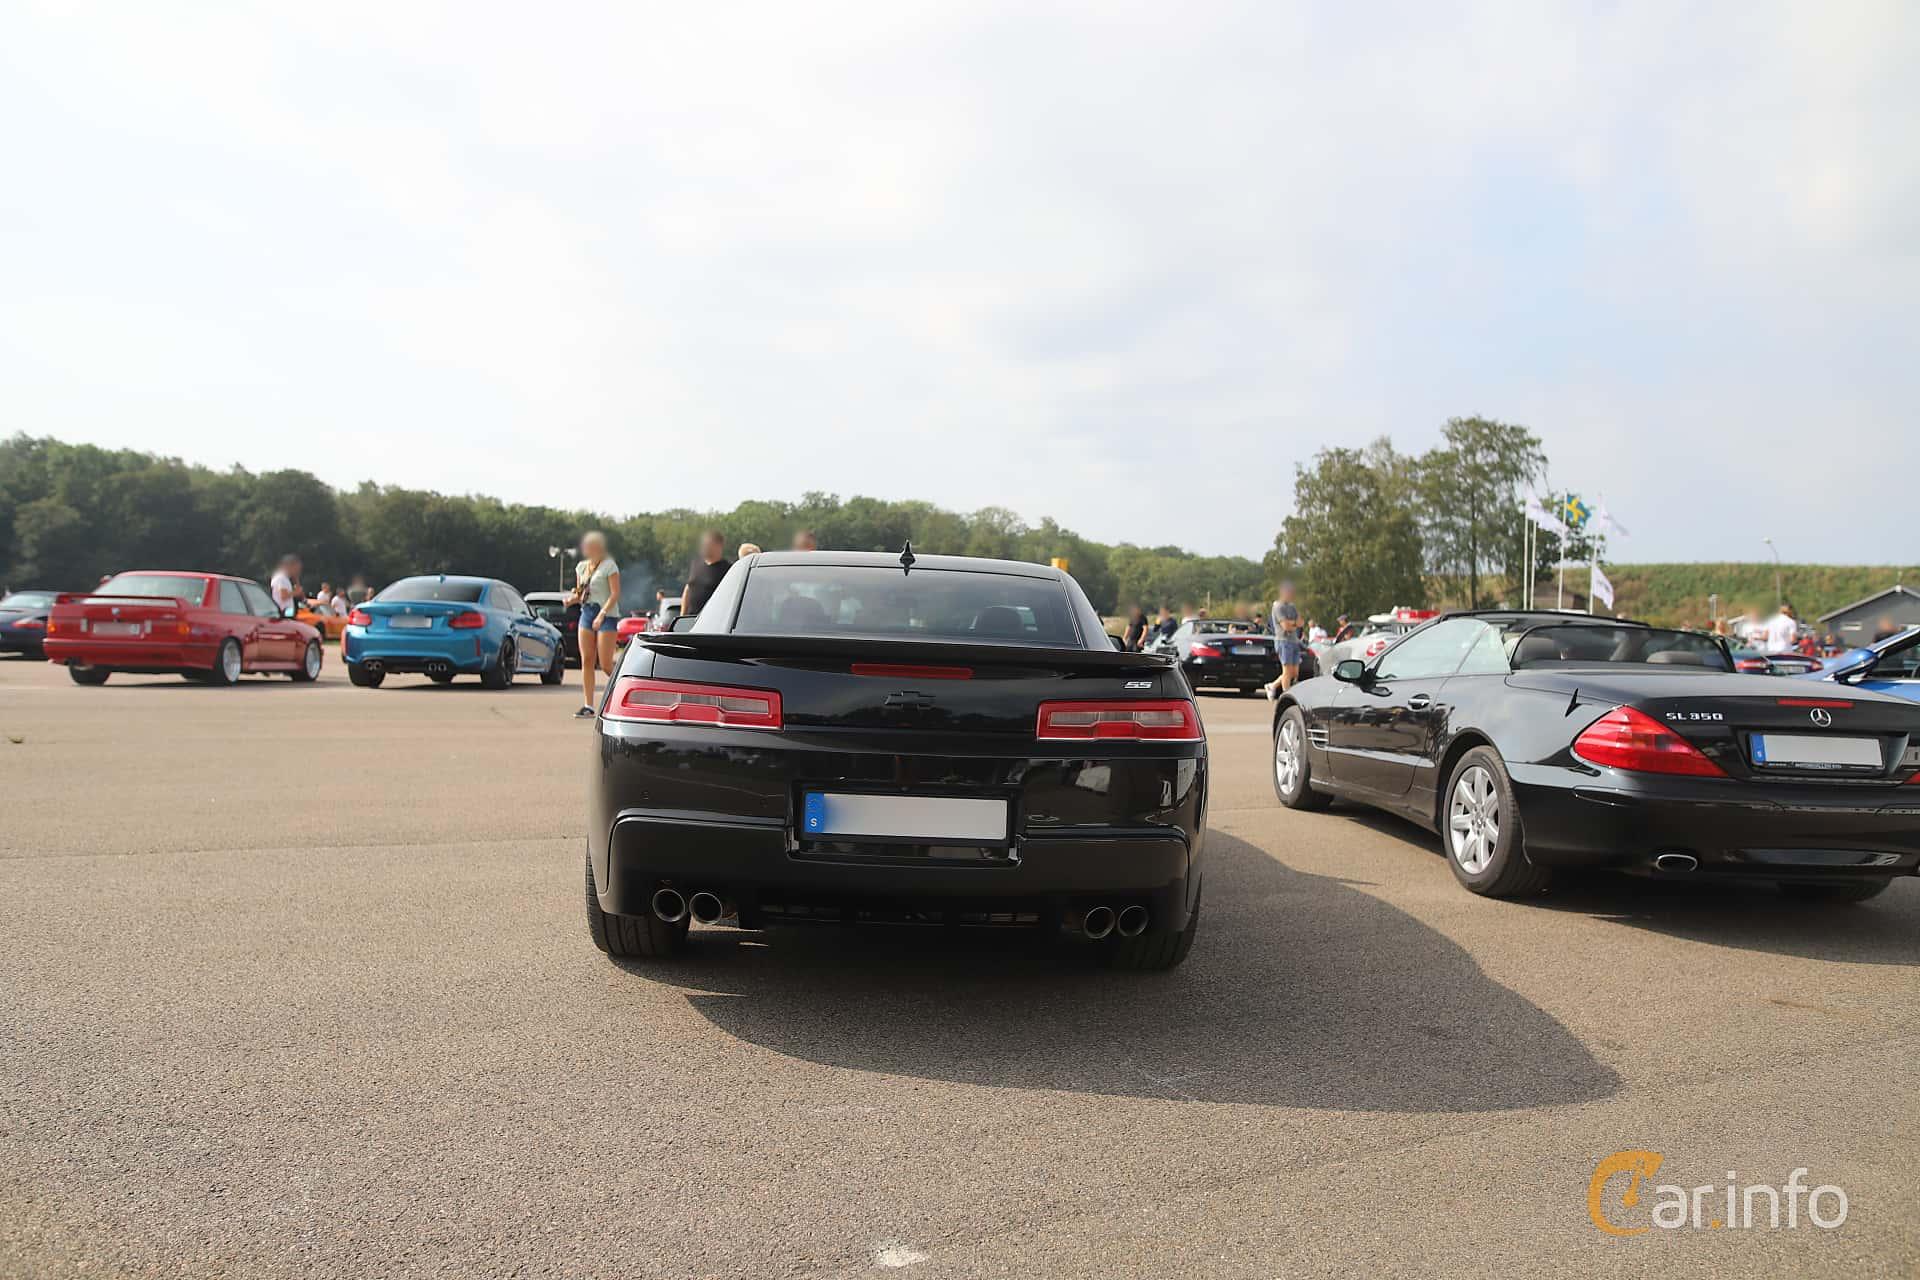 Chevrolet Camaro SS 6.2 V8 Manual, 432hp, 2014 at Autoropa Racing day Knutstorp 2019